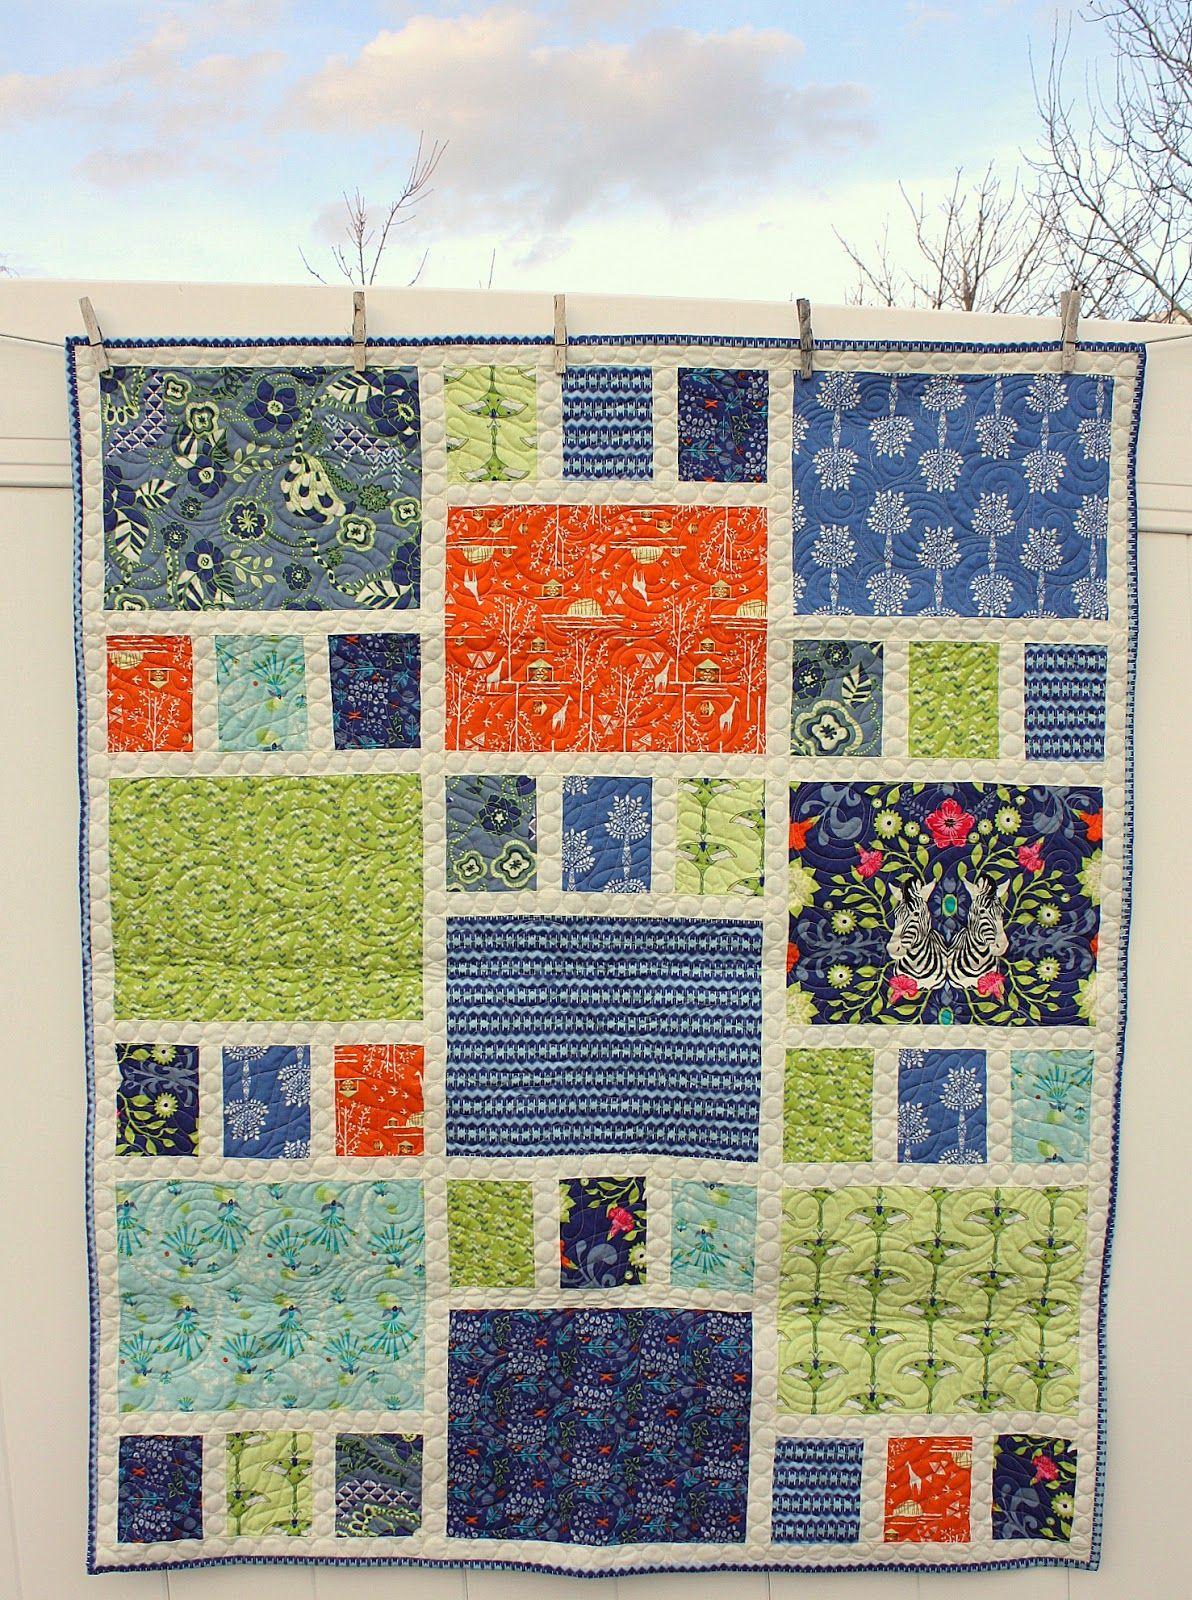 Quilt Patterns For Large Print Fabrics : quilt, patterns, large, print, fabrics, Quilts